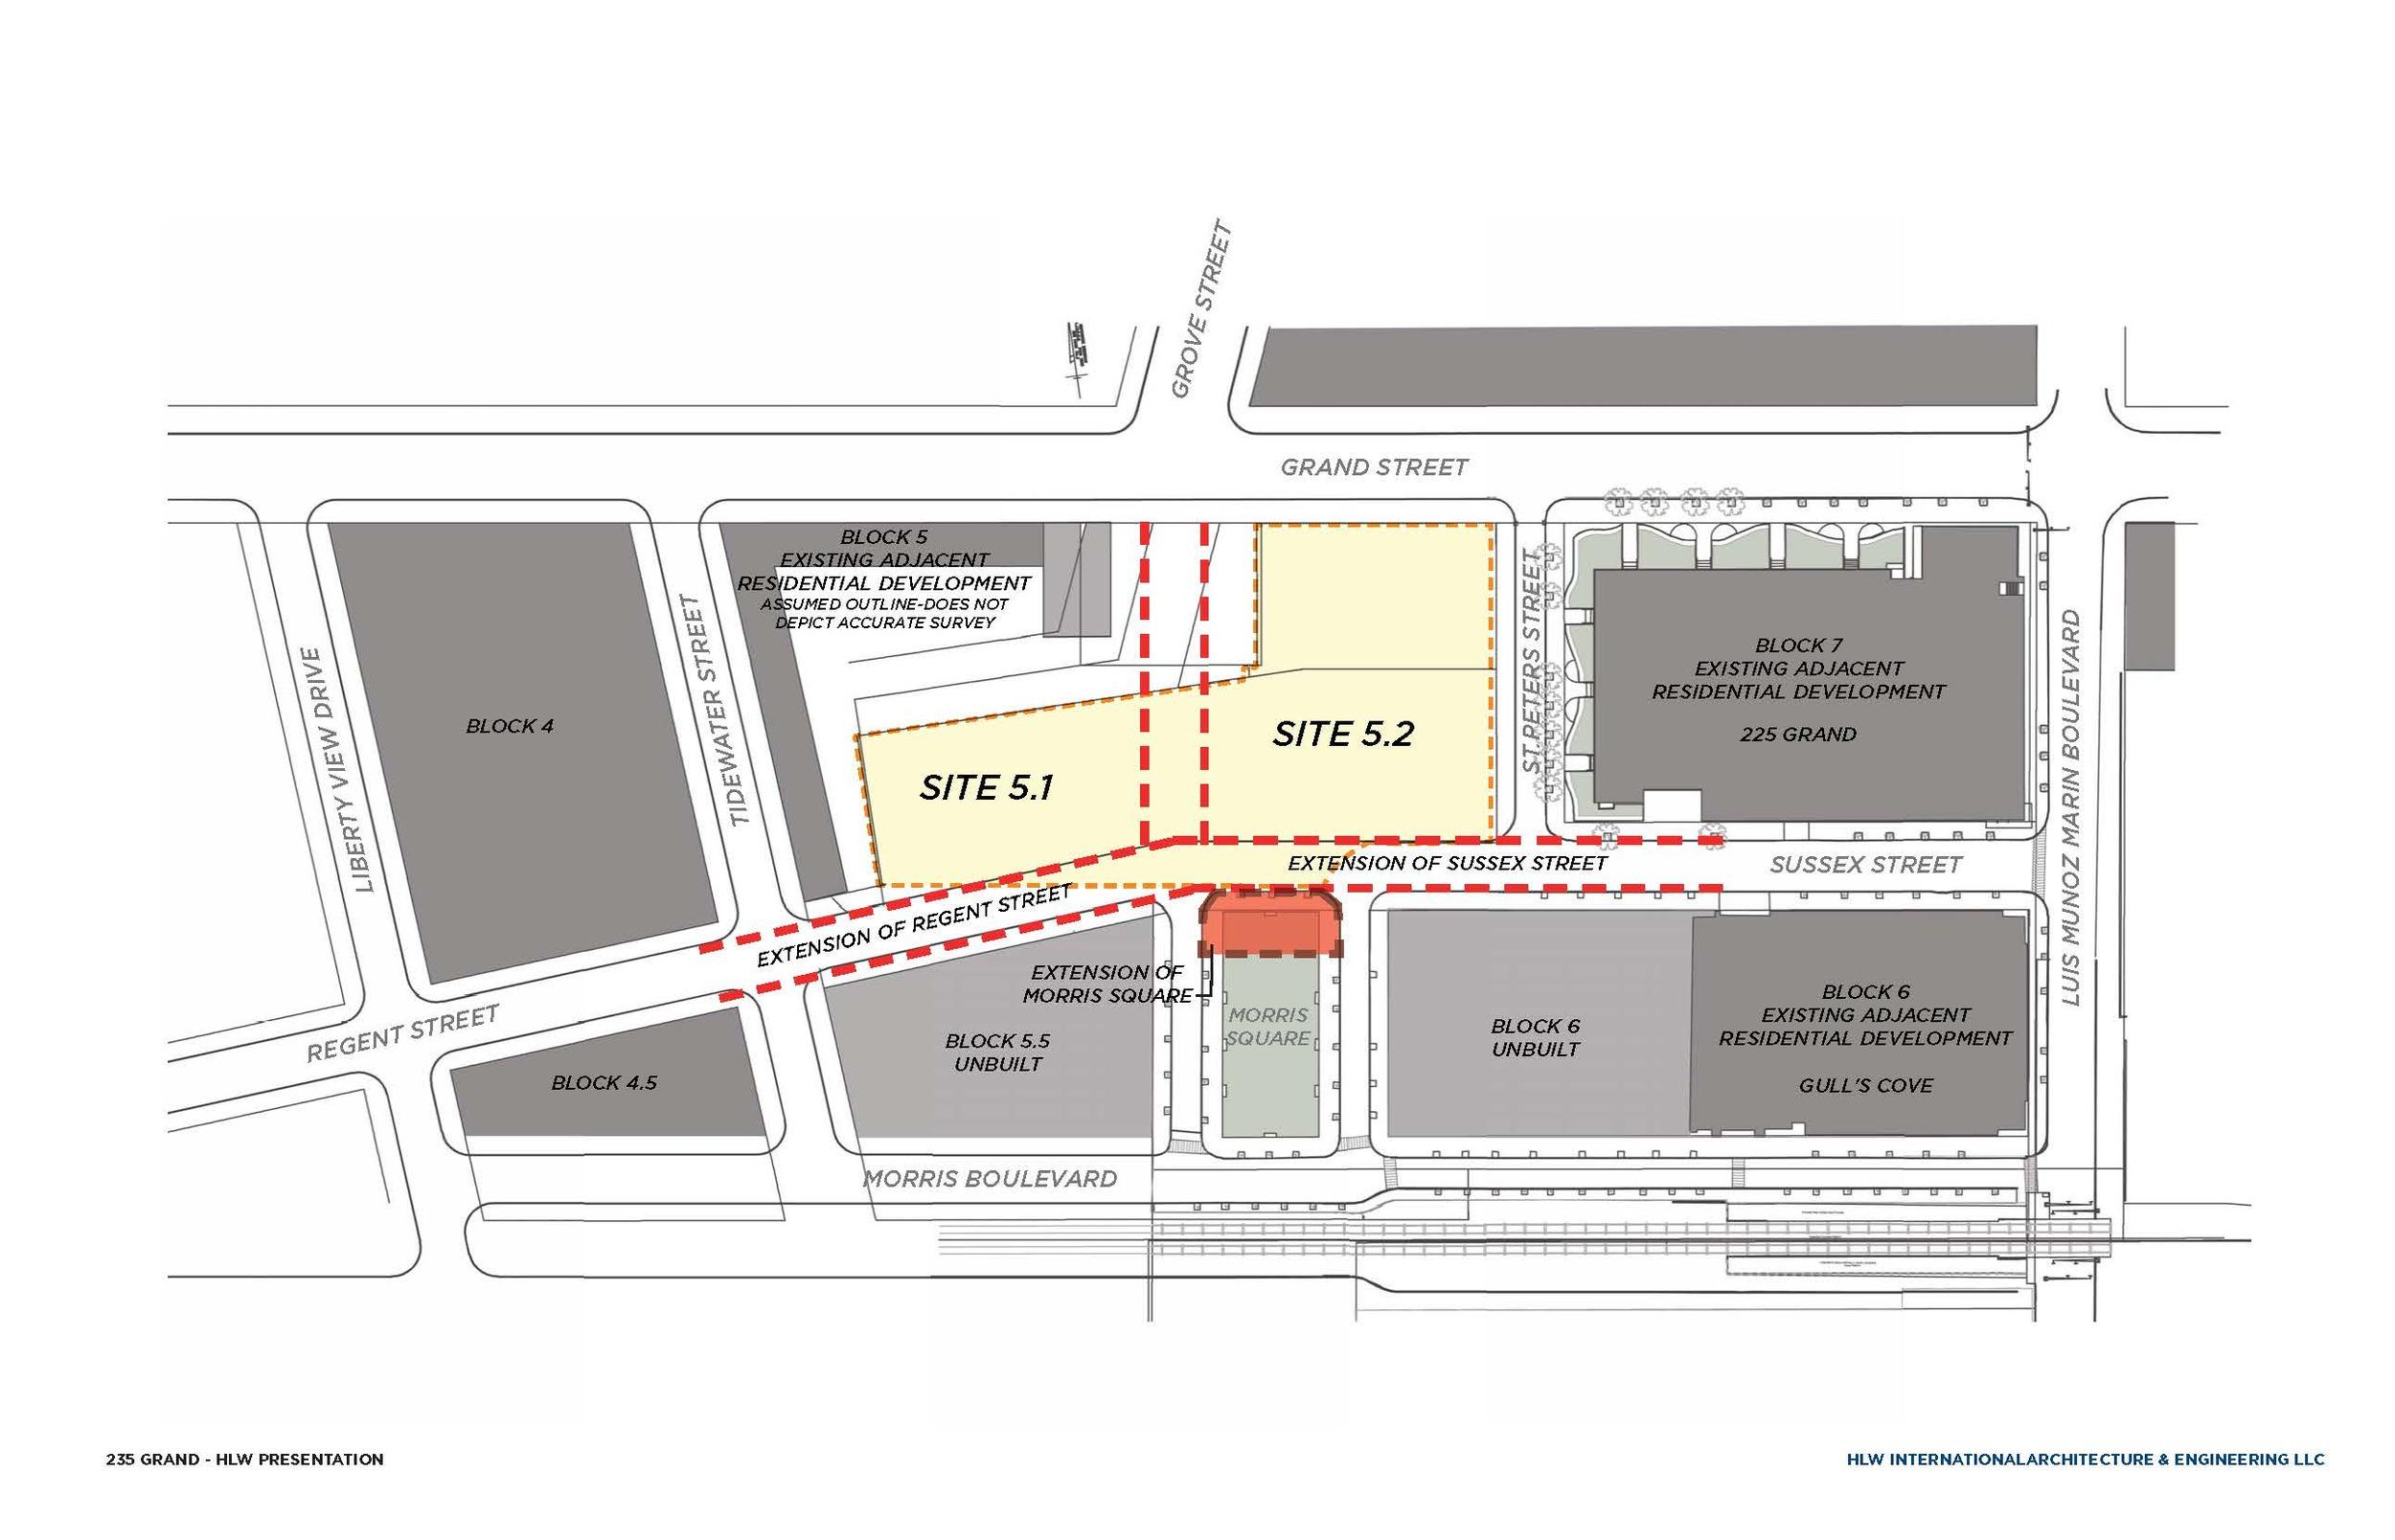 block 5 redevelopment-2